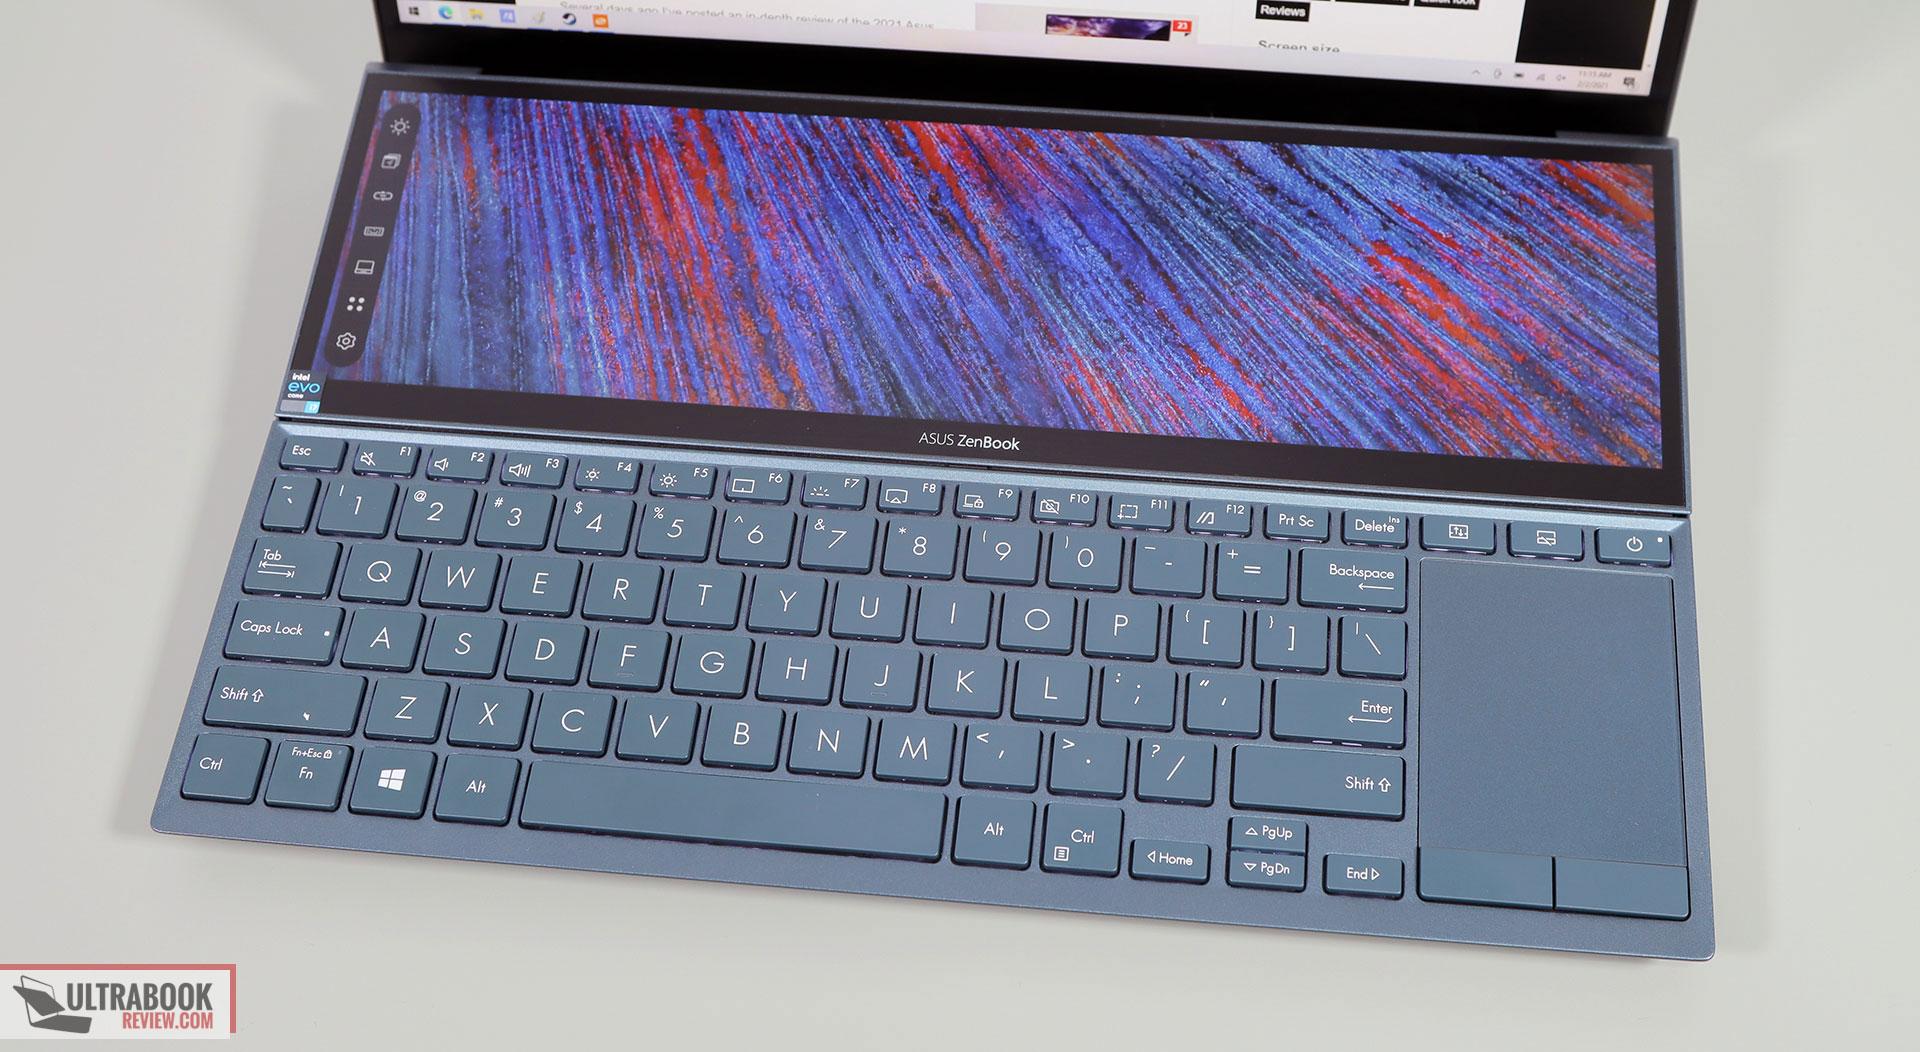 Asus ZenBook Duo 14 UX482 - keyboard